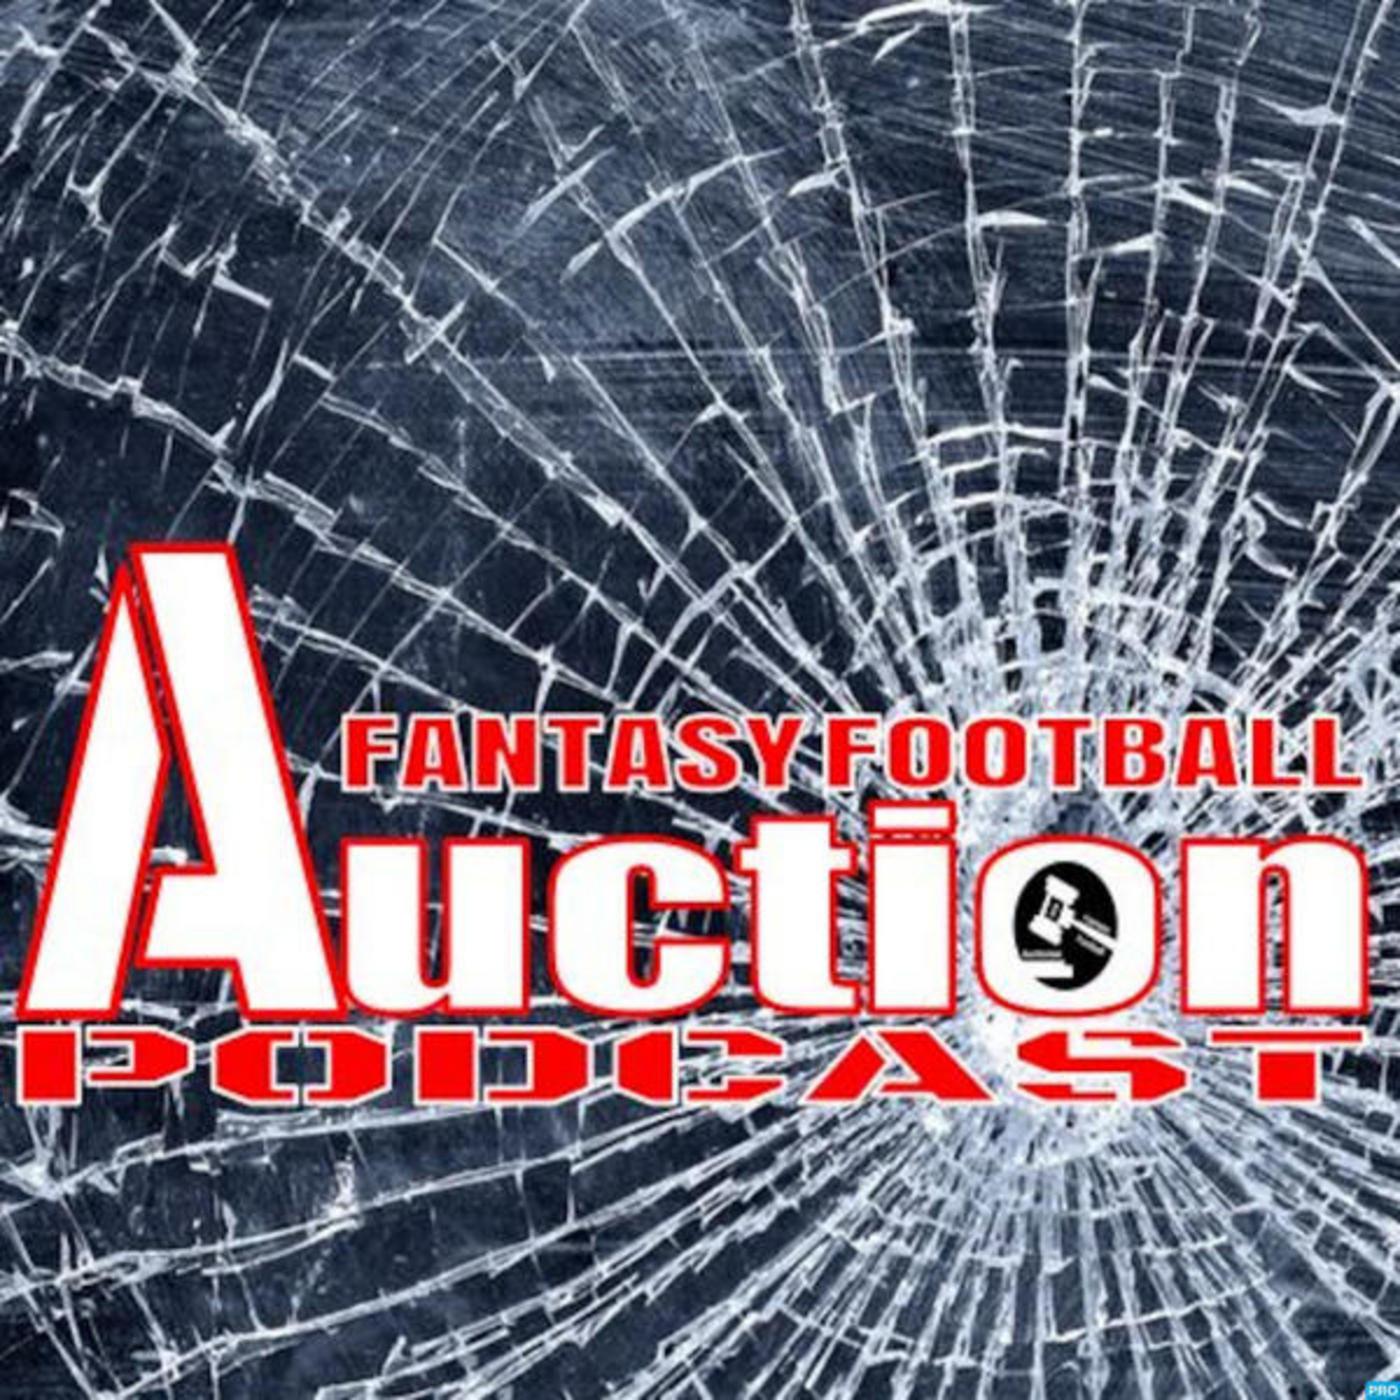 Ep64 Week 15 Fantasy Football - A McCoy Blizzard with Extra Josh